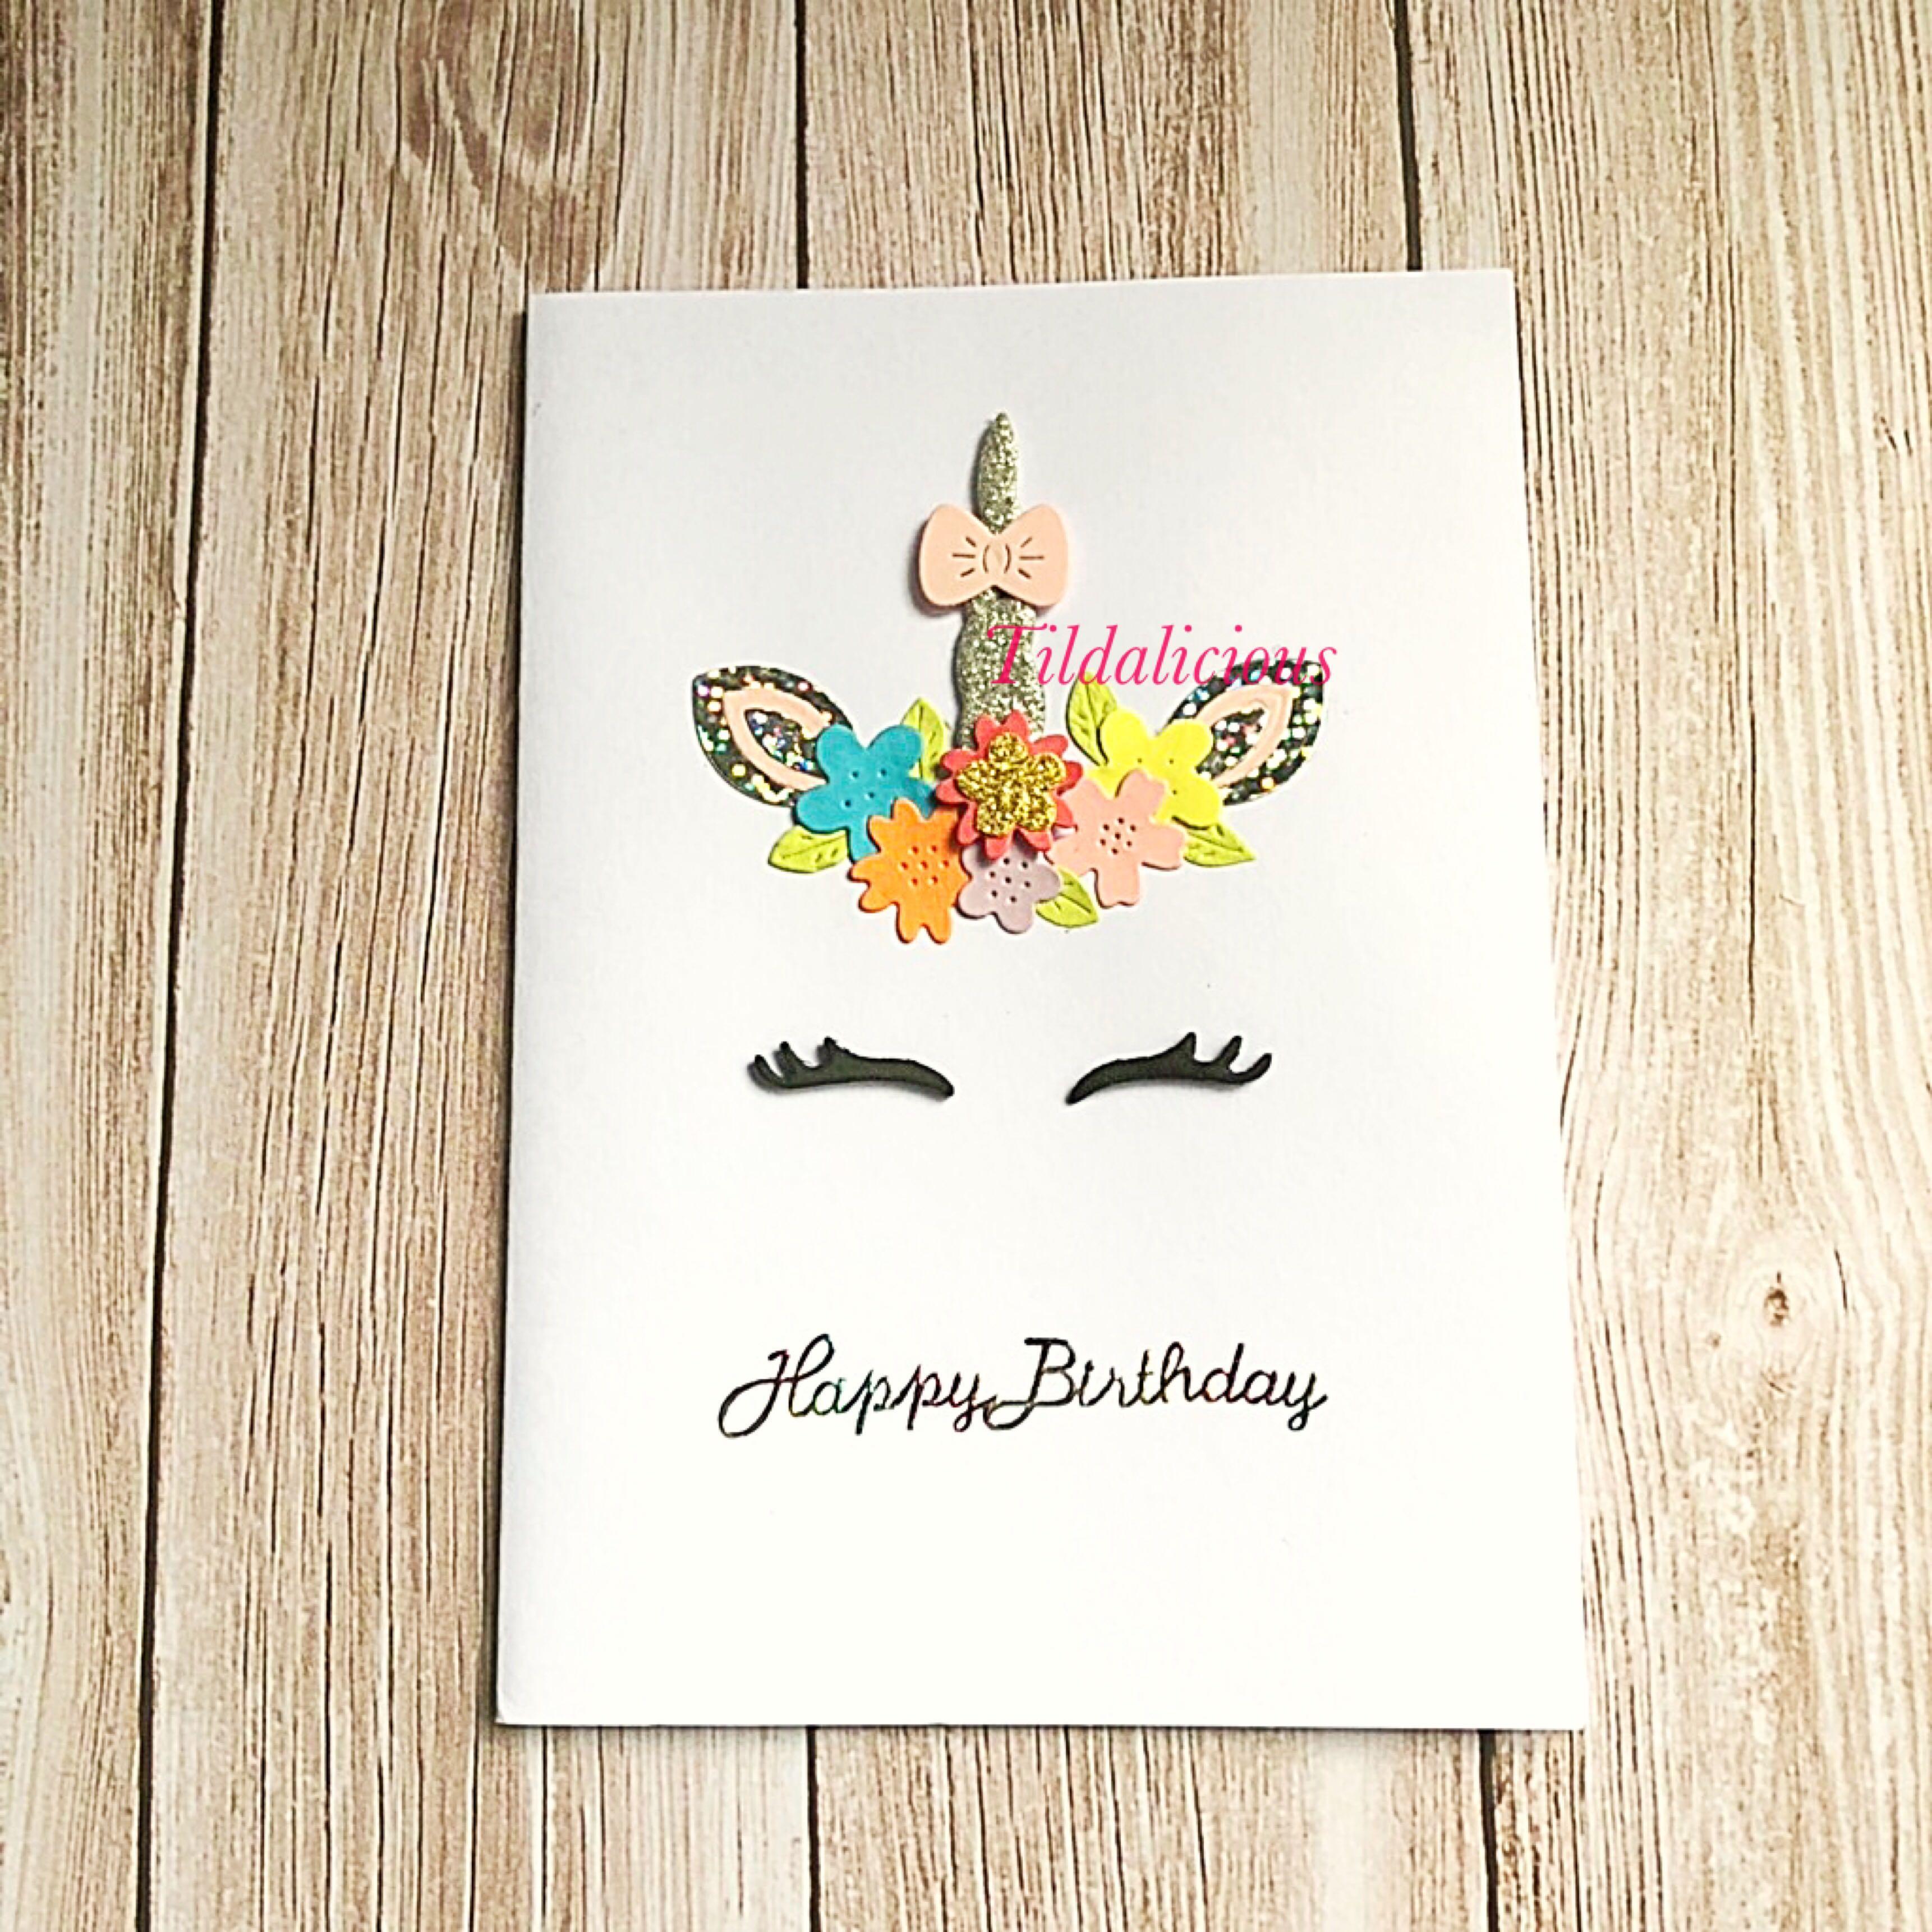 Handmade Unicorn Birthday Card Design Craft On